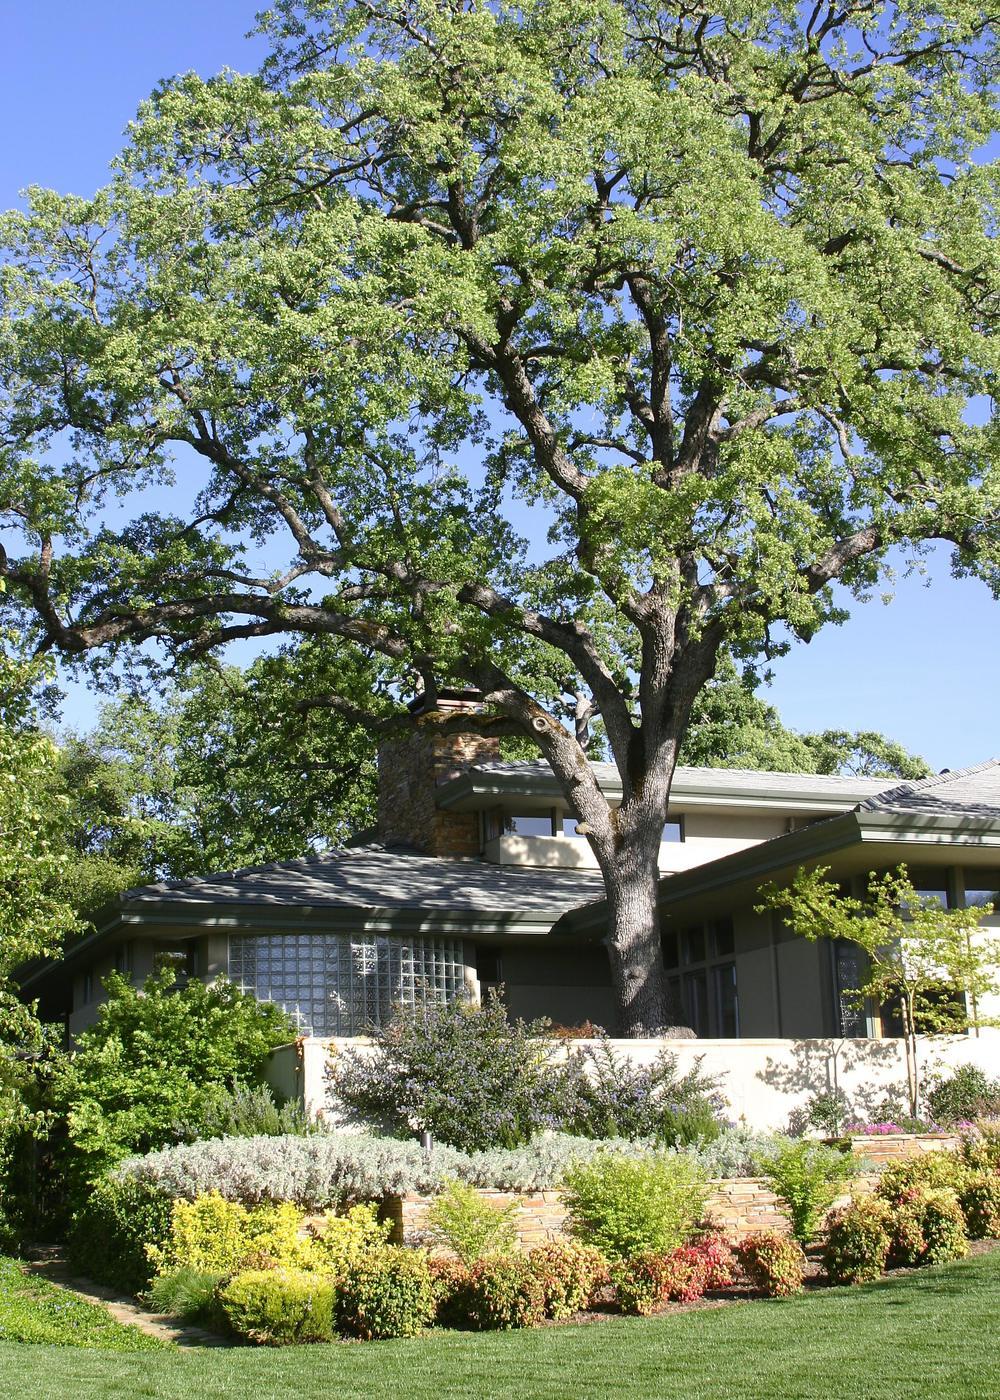 Courtyard surrounding existing large oak.